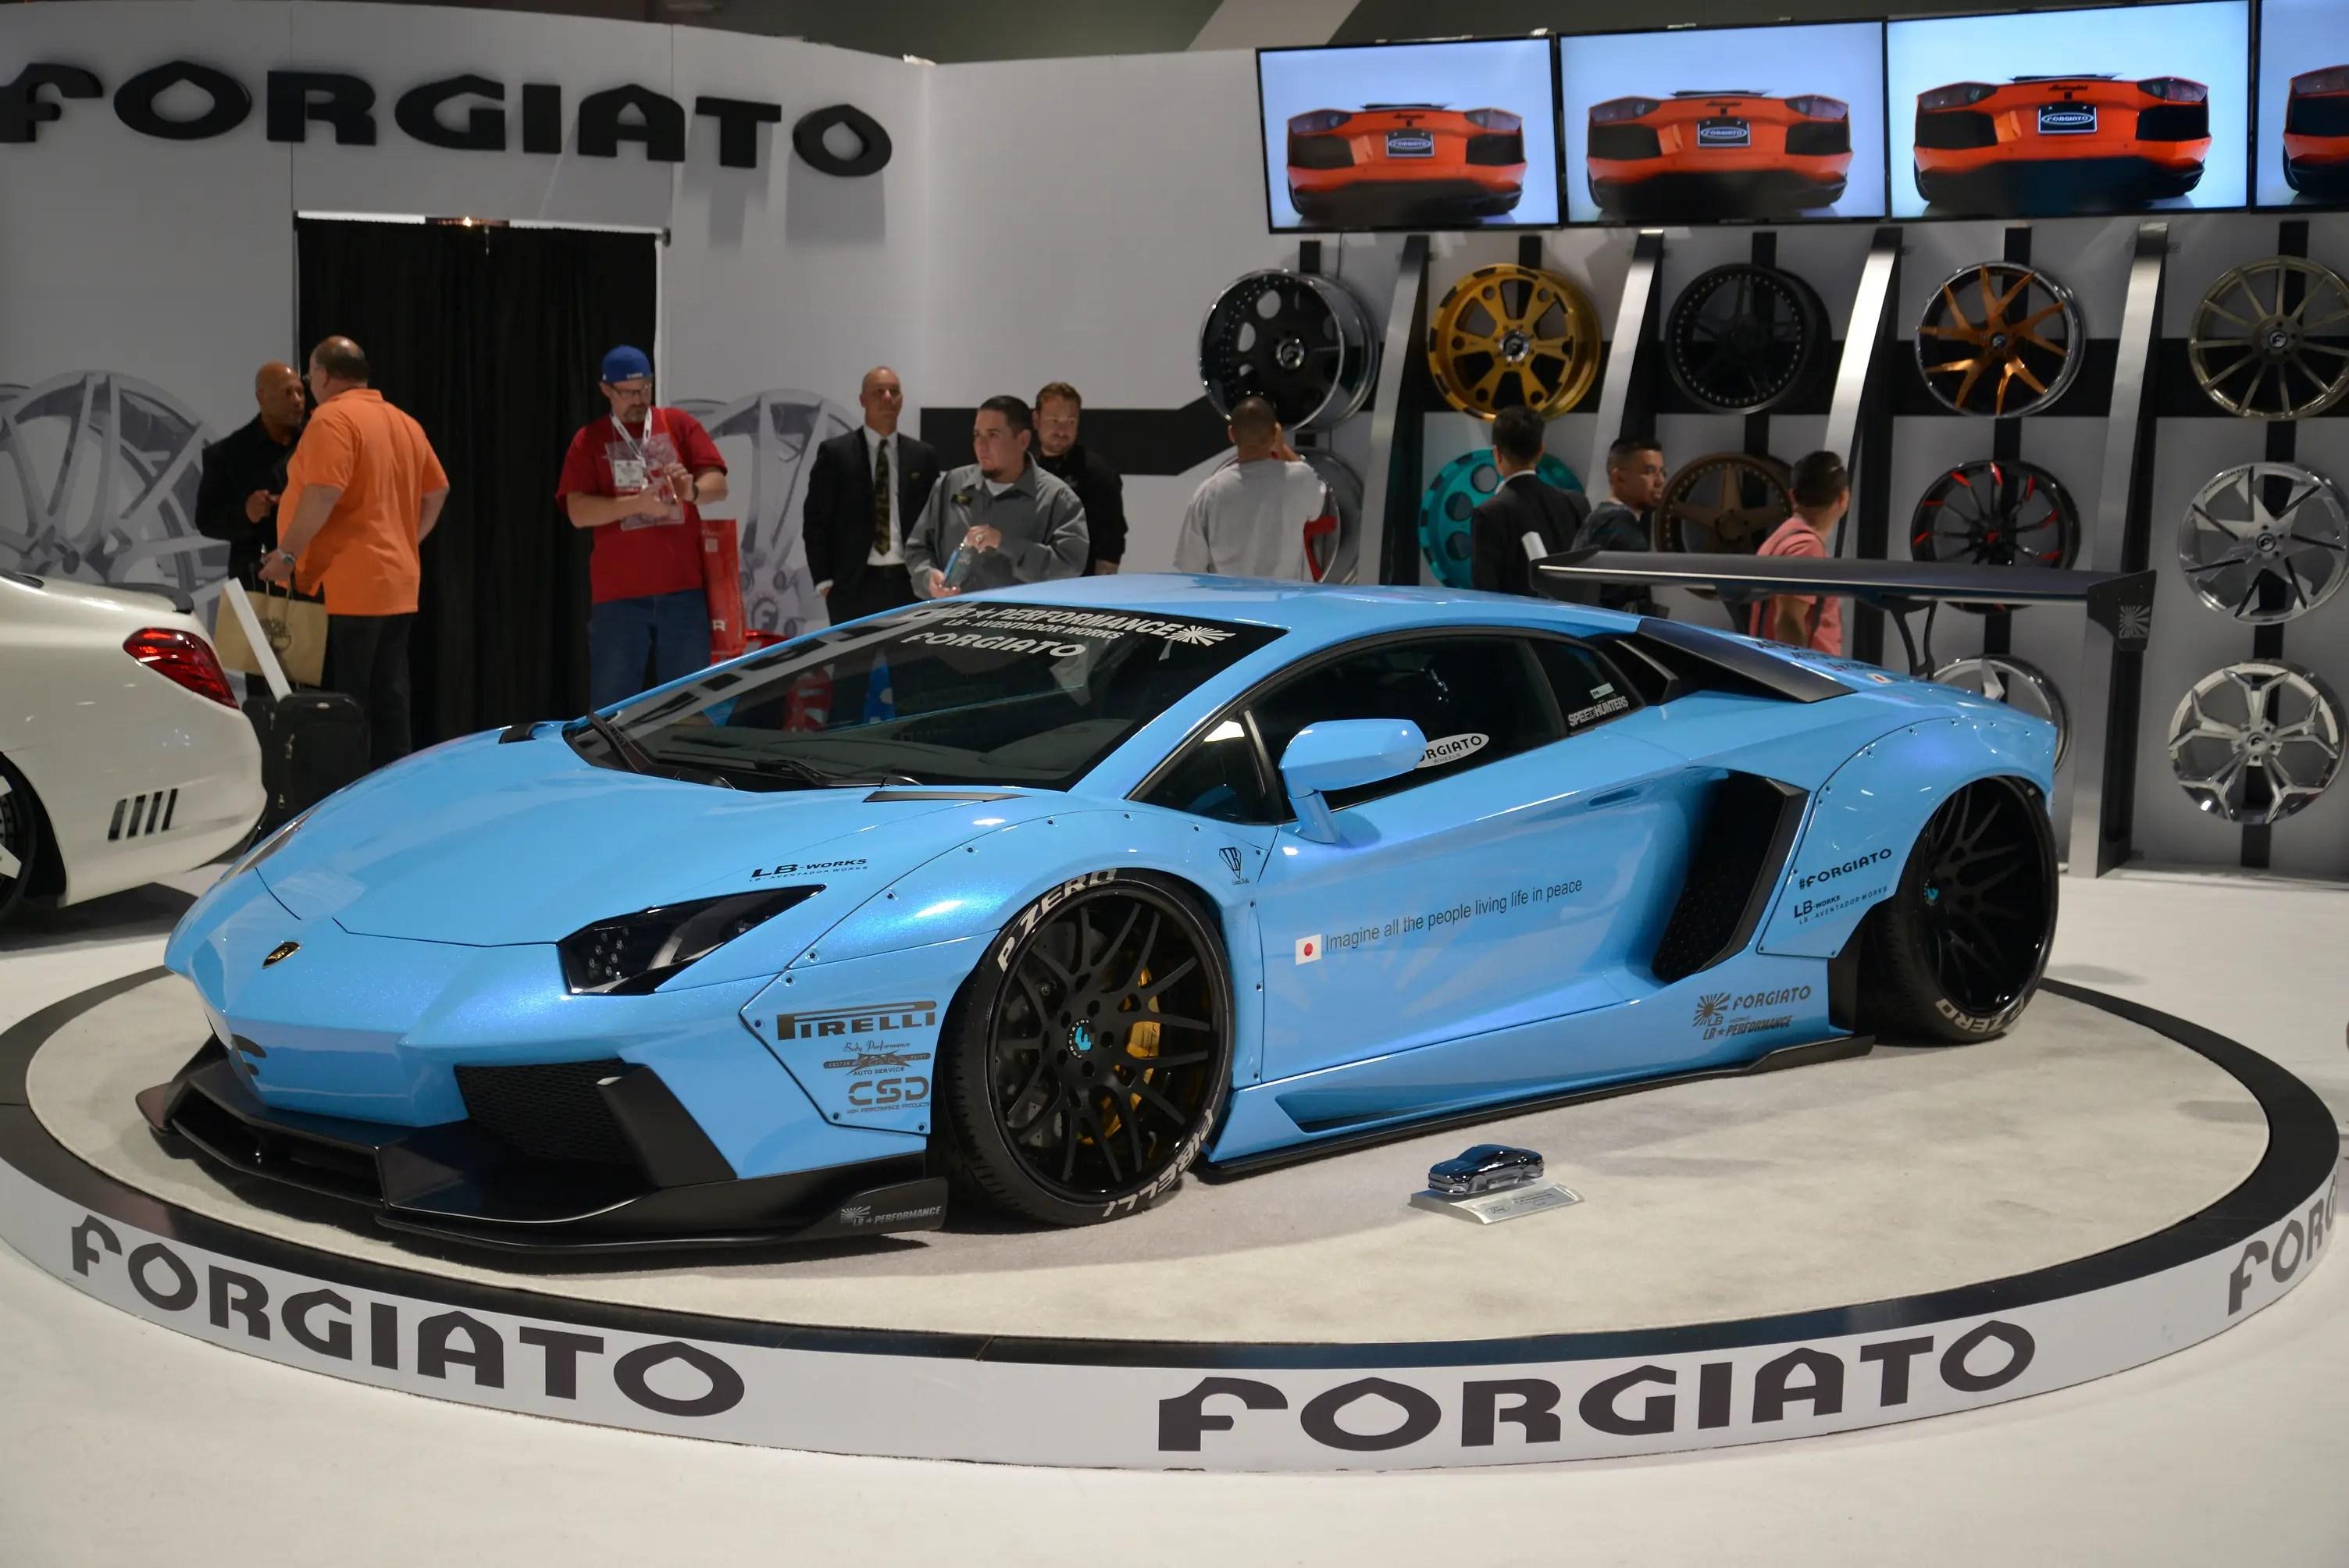 ... or this Lamborghini Aventador with aftermarket Forgiato wheels.